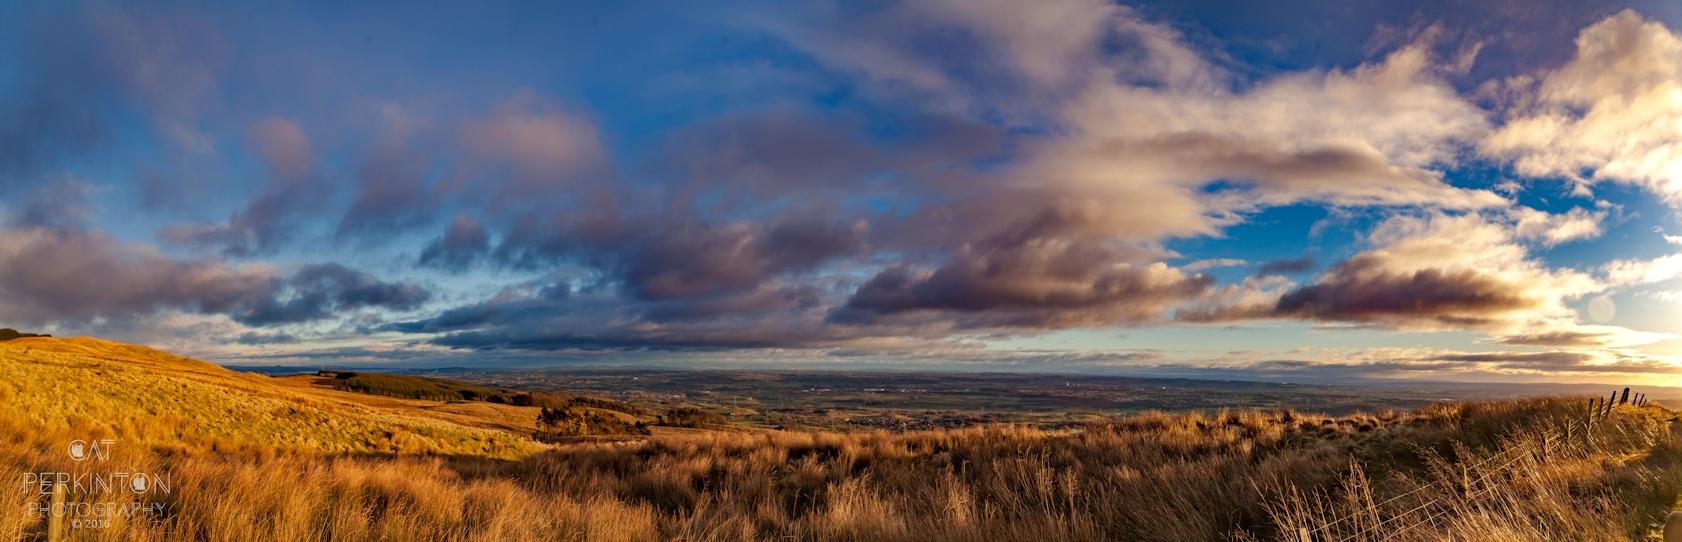 Kelvin Valley Panorama 01/01/17